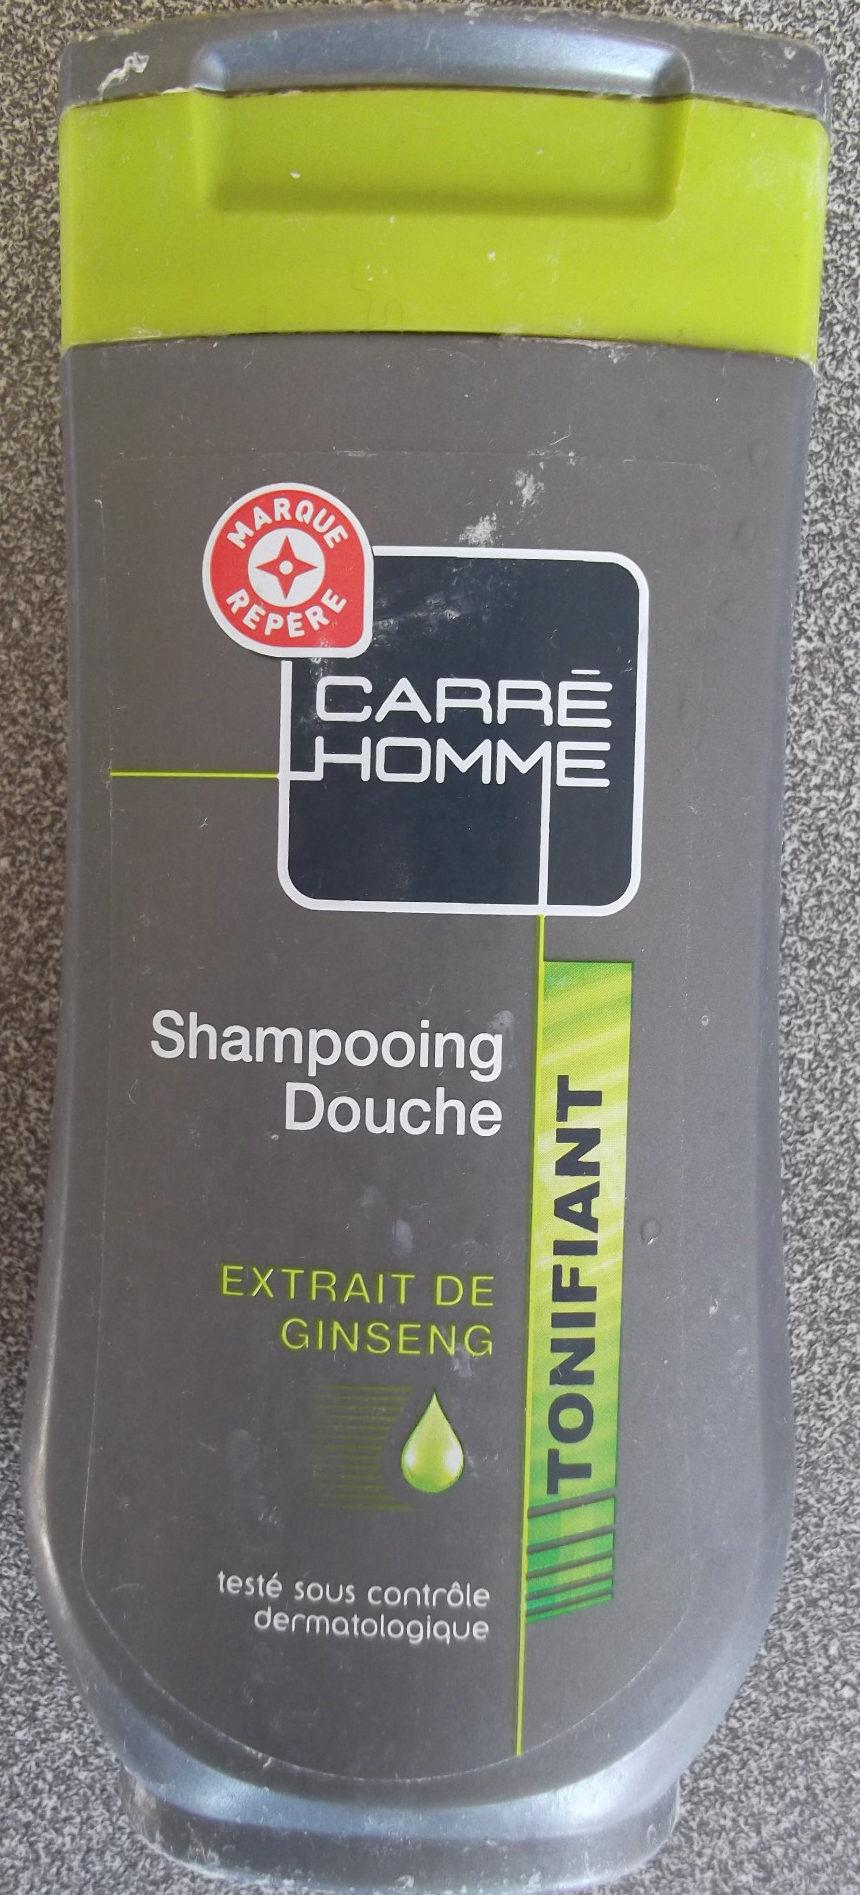 Shanpooing Douche Tonifiant - Produit - fr